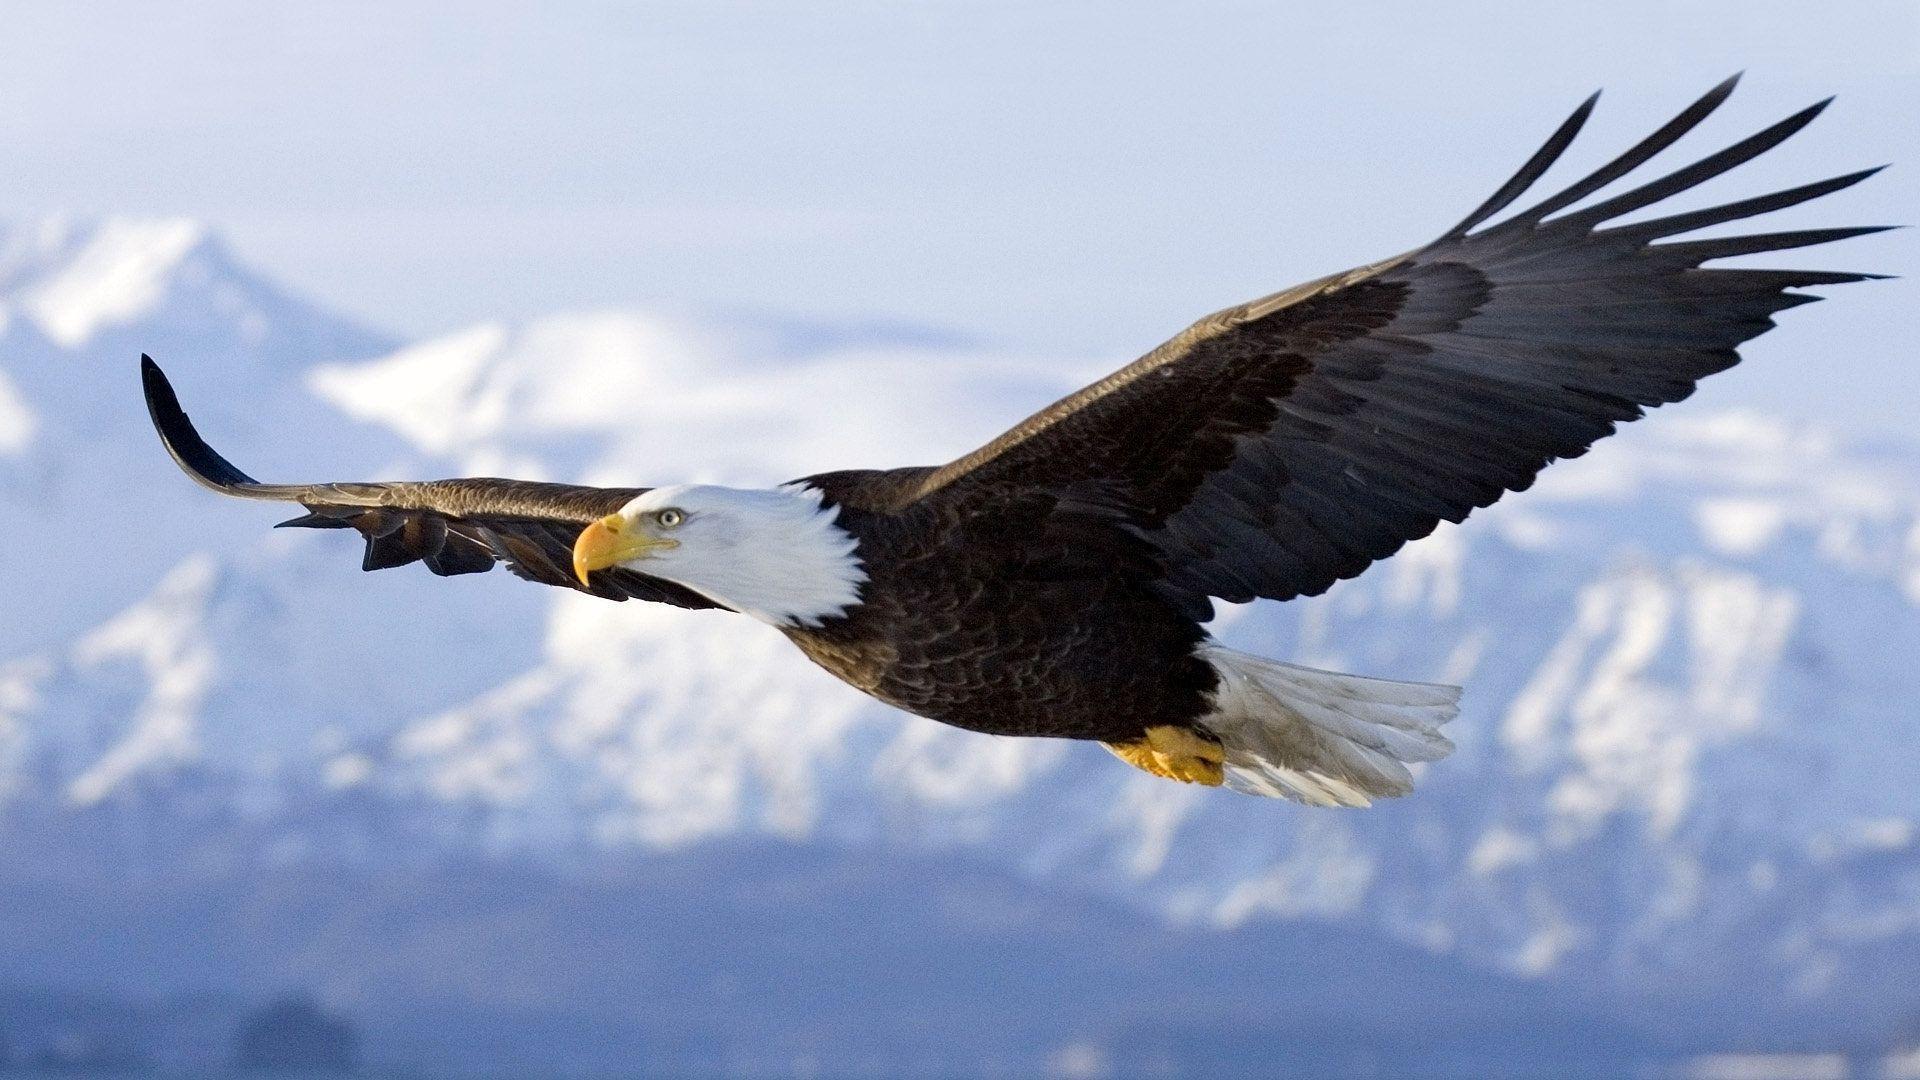 Eagle In Flight Computer Wallpapers, Desktop Backgrounds ...